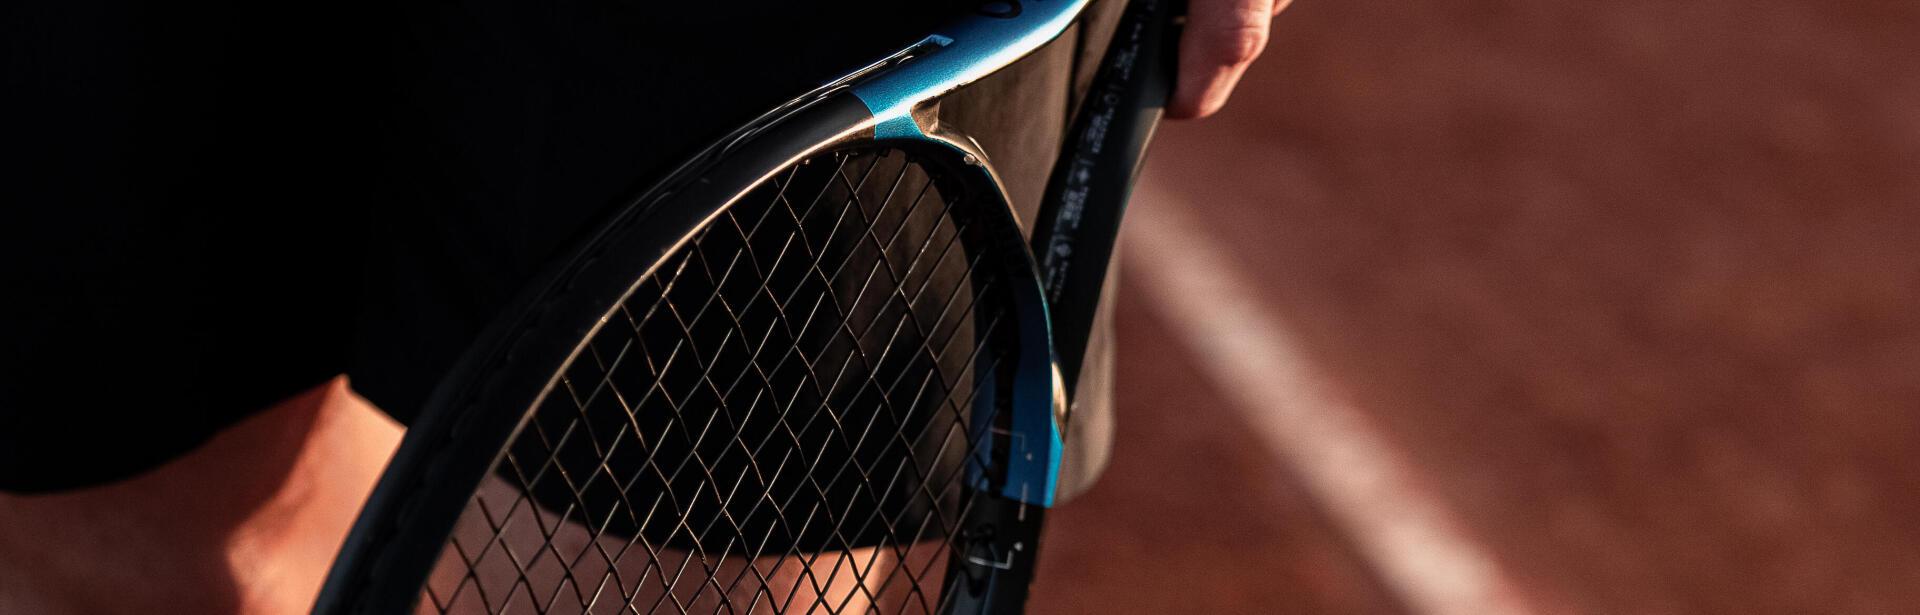 La raquette de tennis